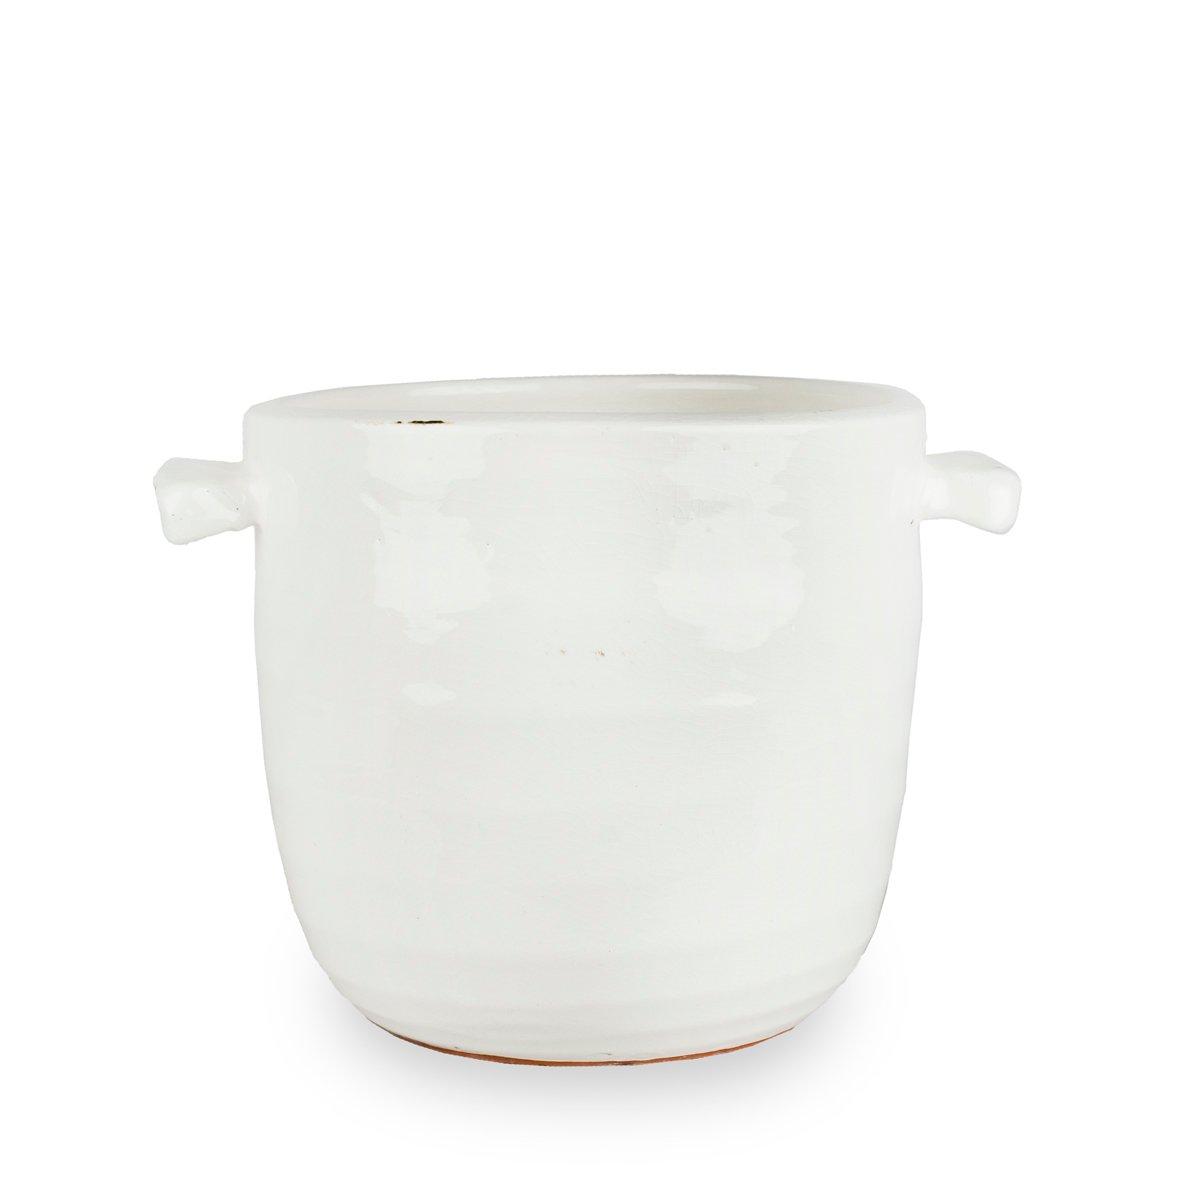 Olsson & Jensen kruka keramik vit